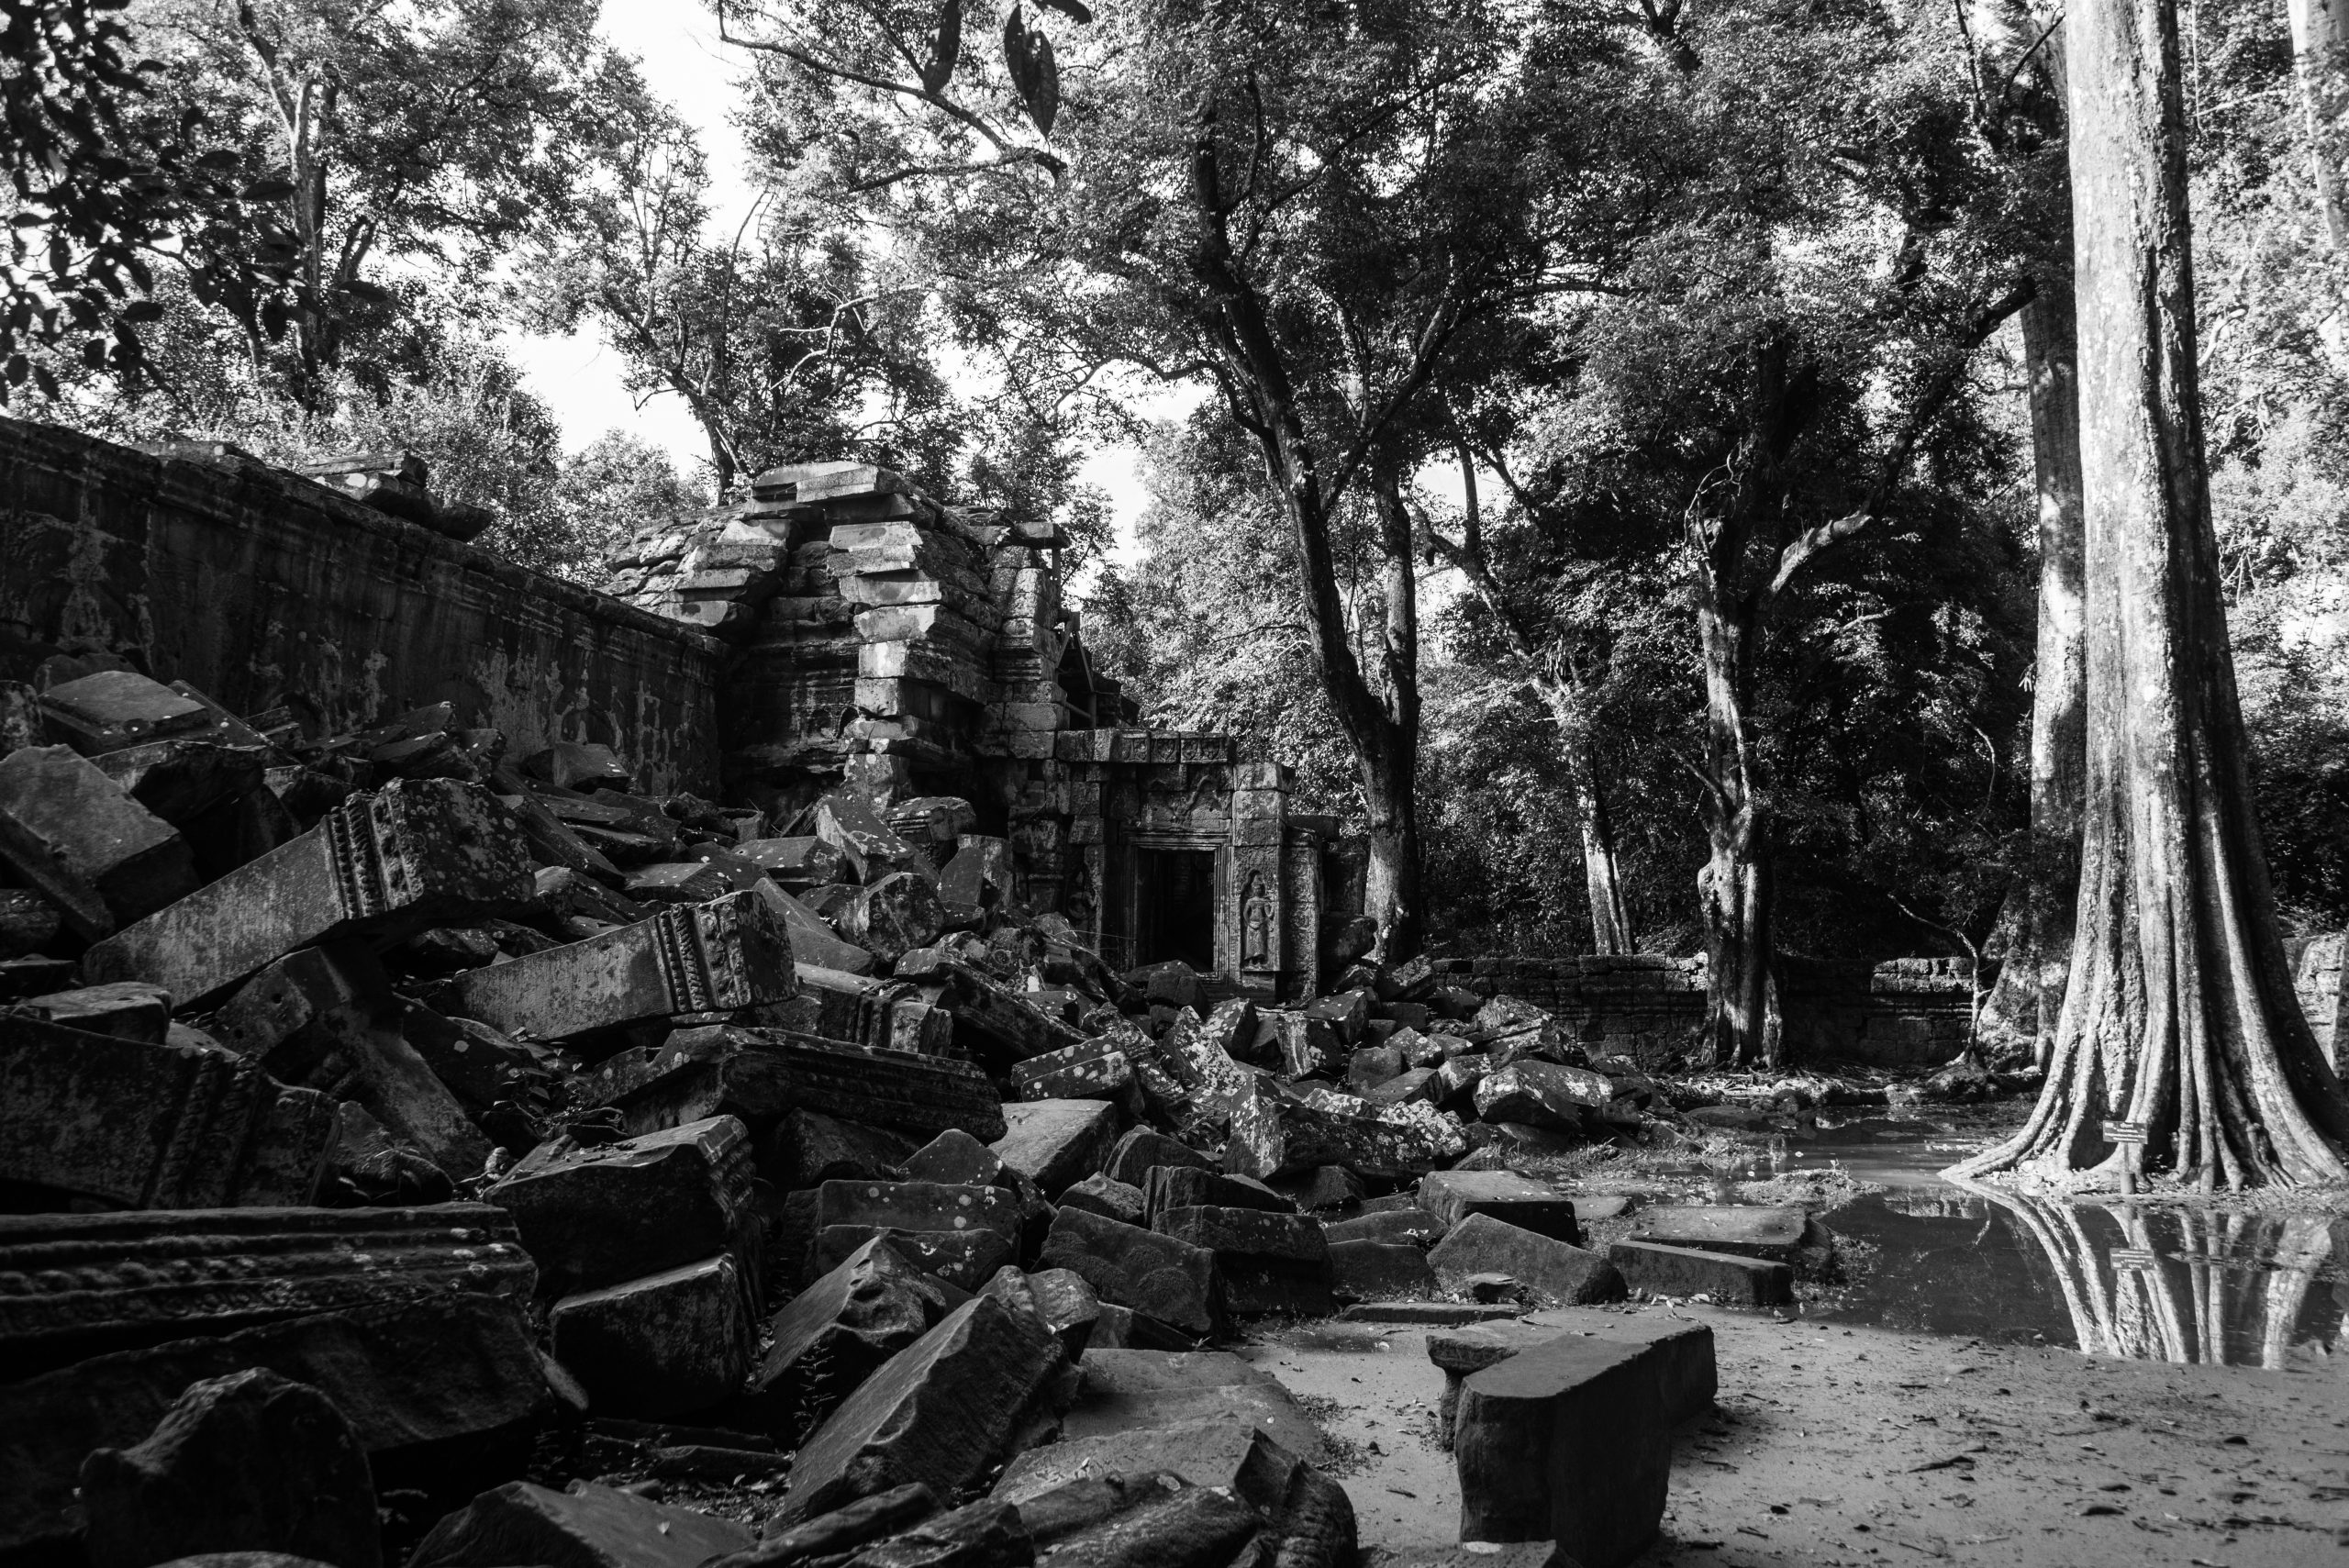 Preah Khan, Siem Reap, Cambodia, Asia